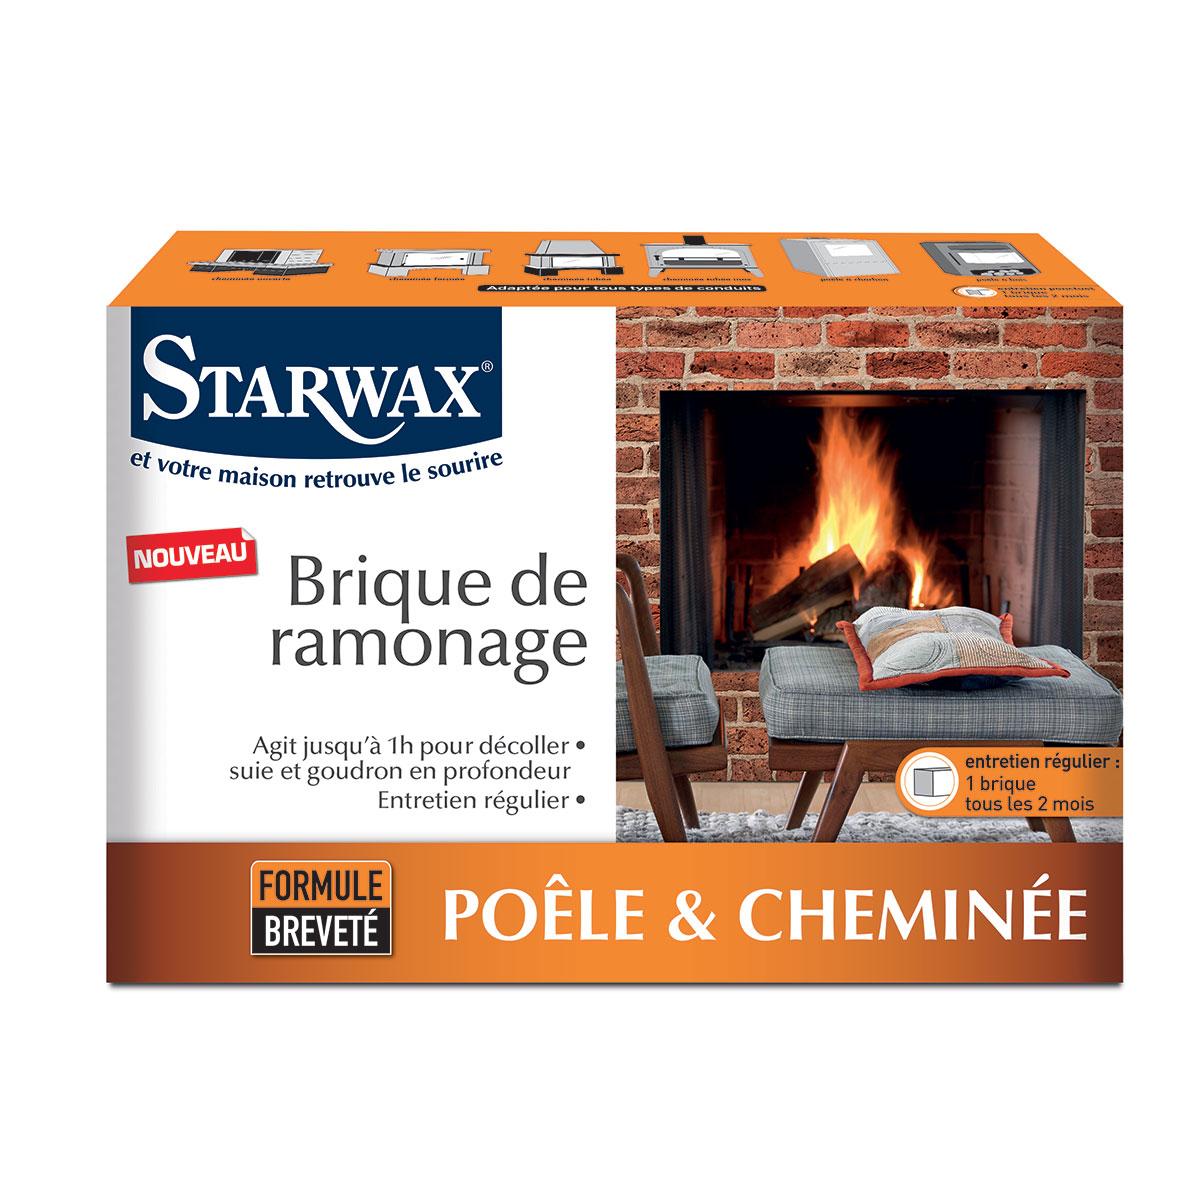 Brique de ramonage - Starwax